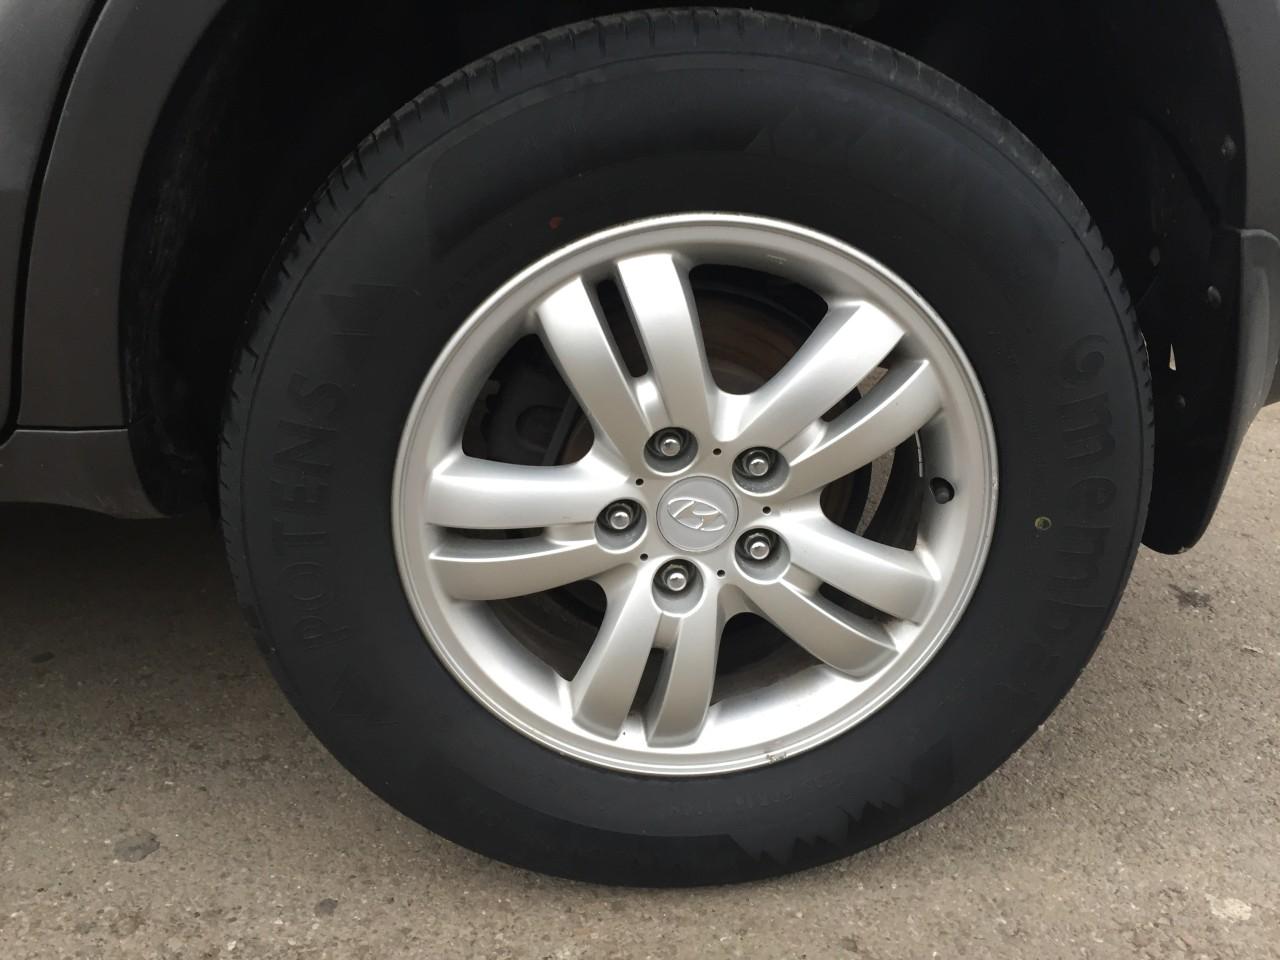 Hyundai Tucson 4x4 / Piele ventilata / CLIMATRONIC 2007